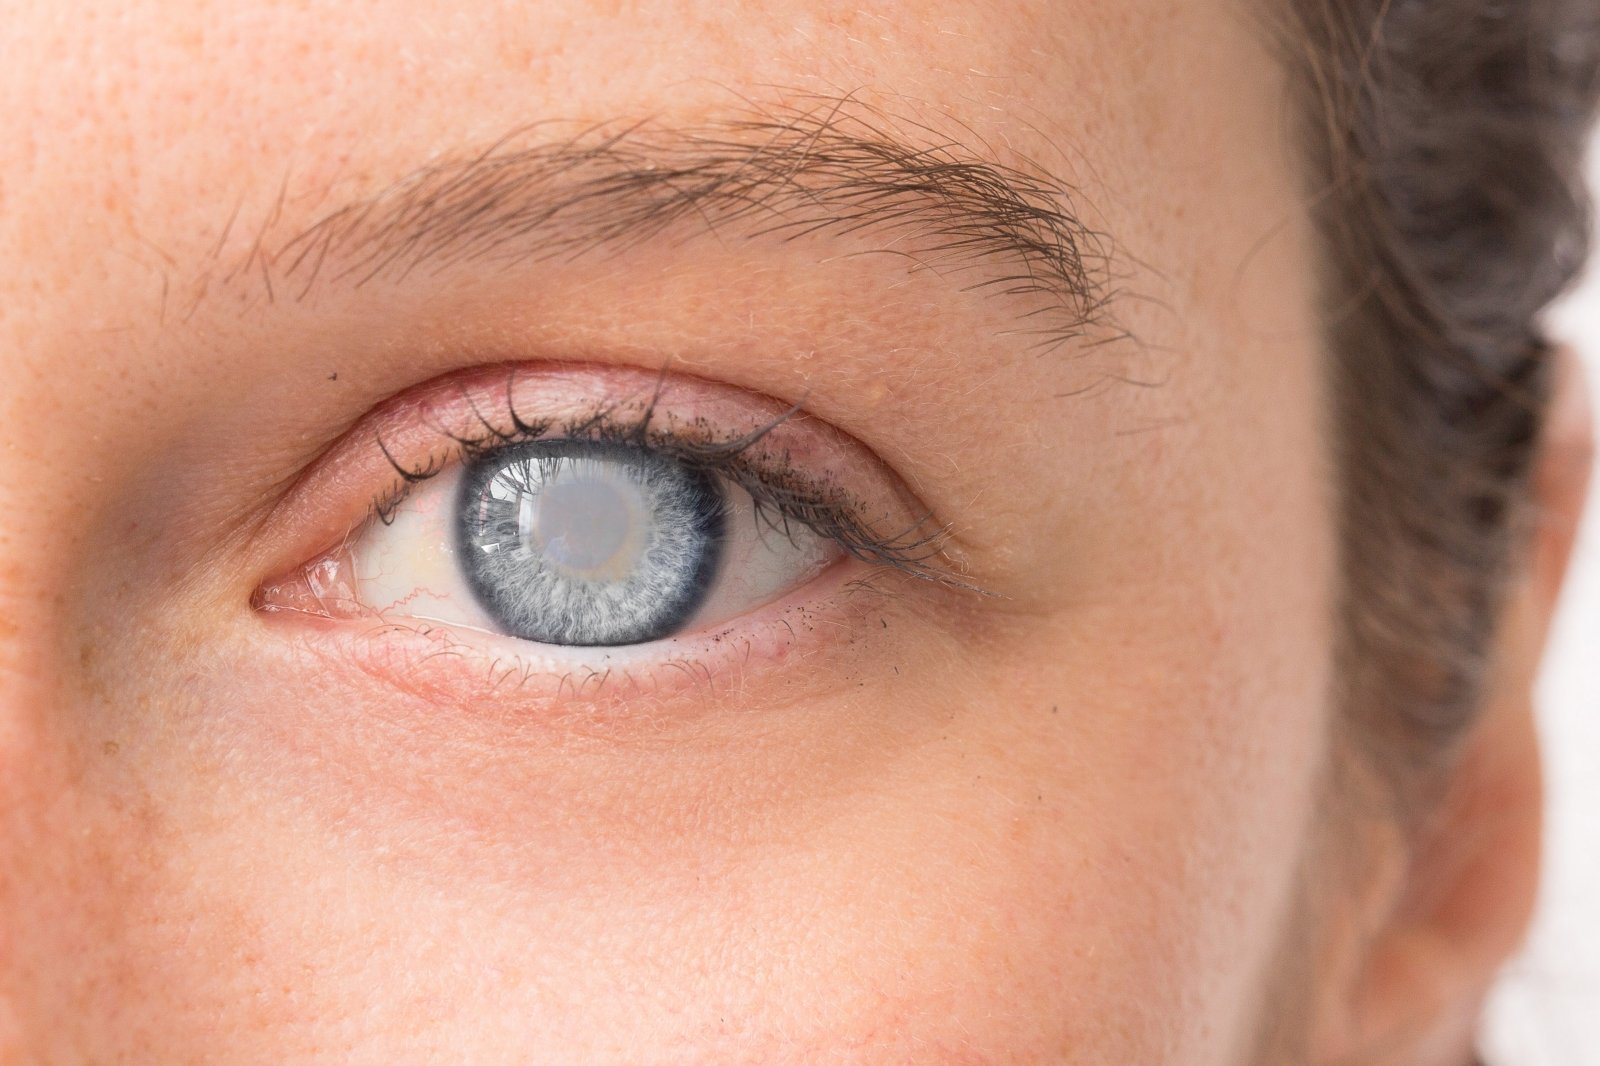 kapiliarai akies hipertenzijoje begonija nuo hipertenzijos